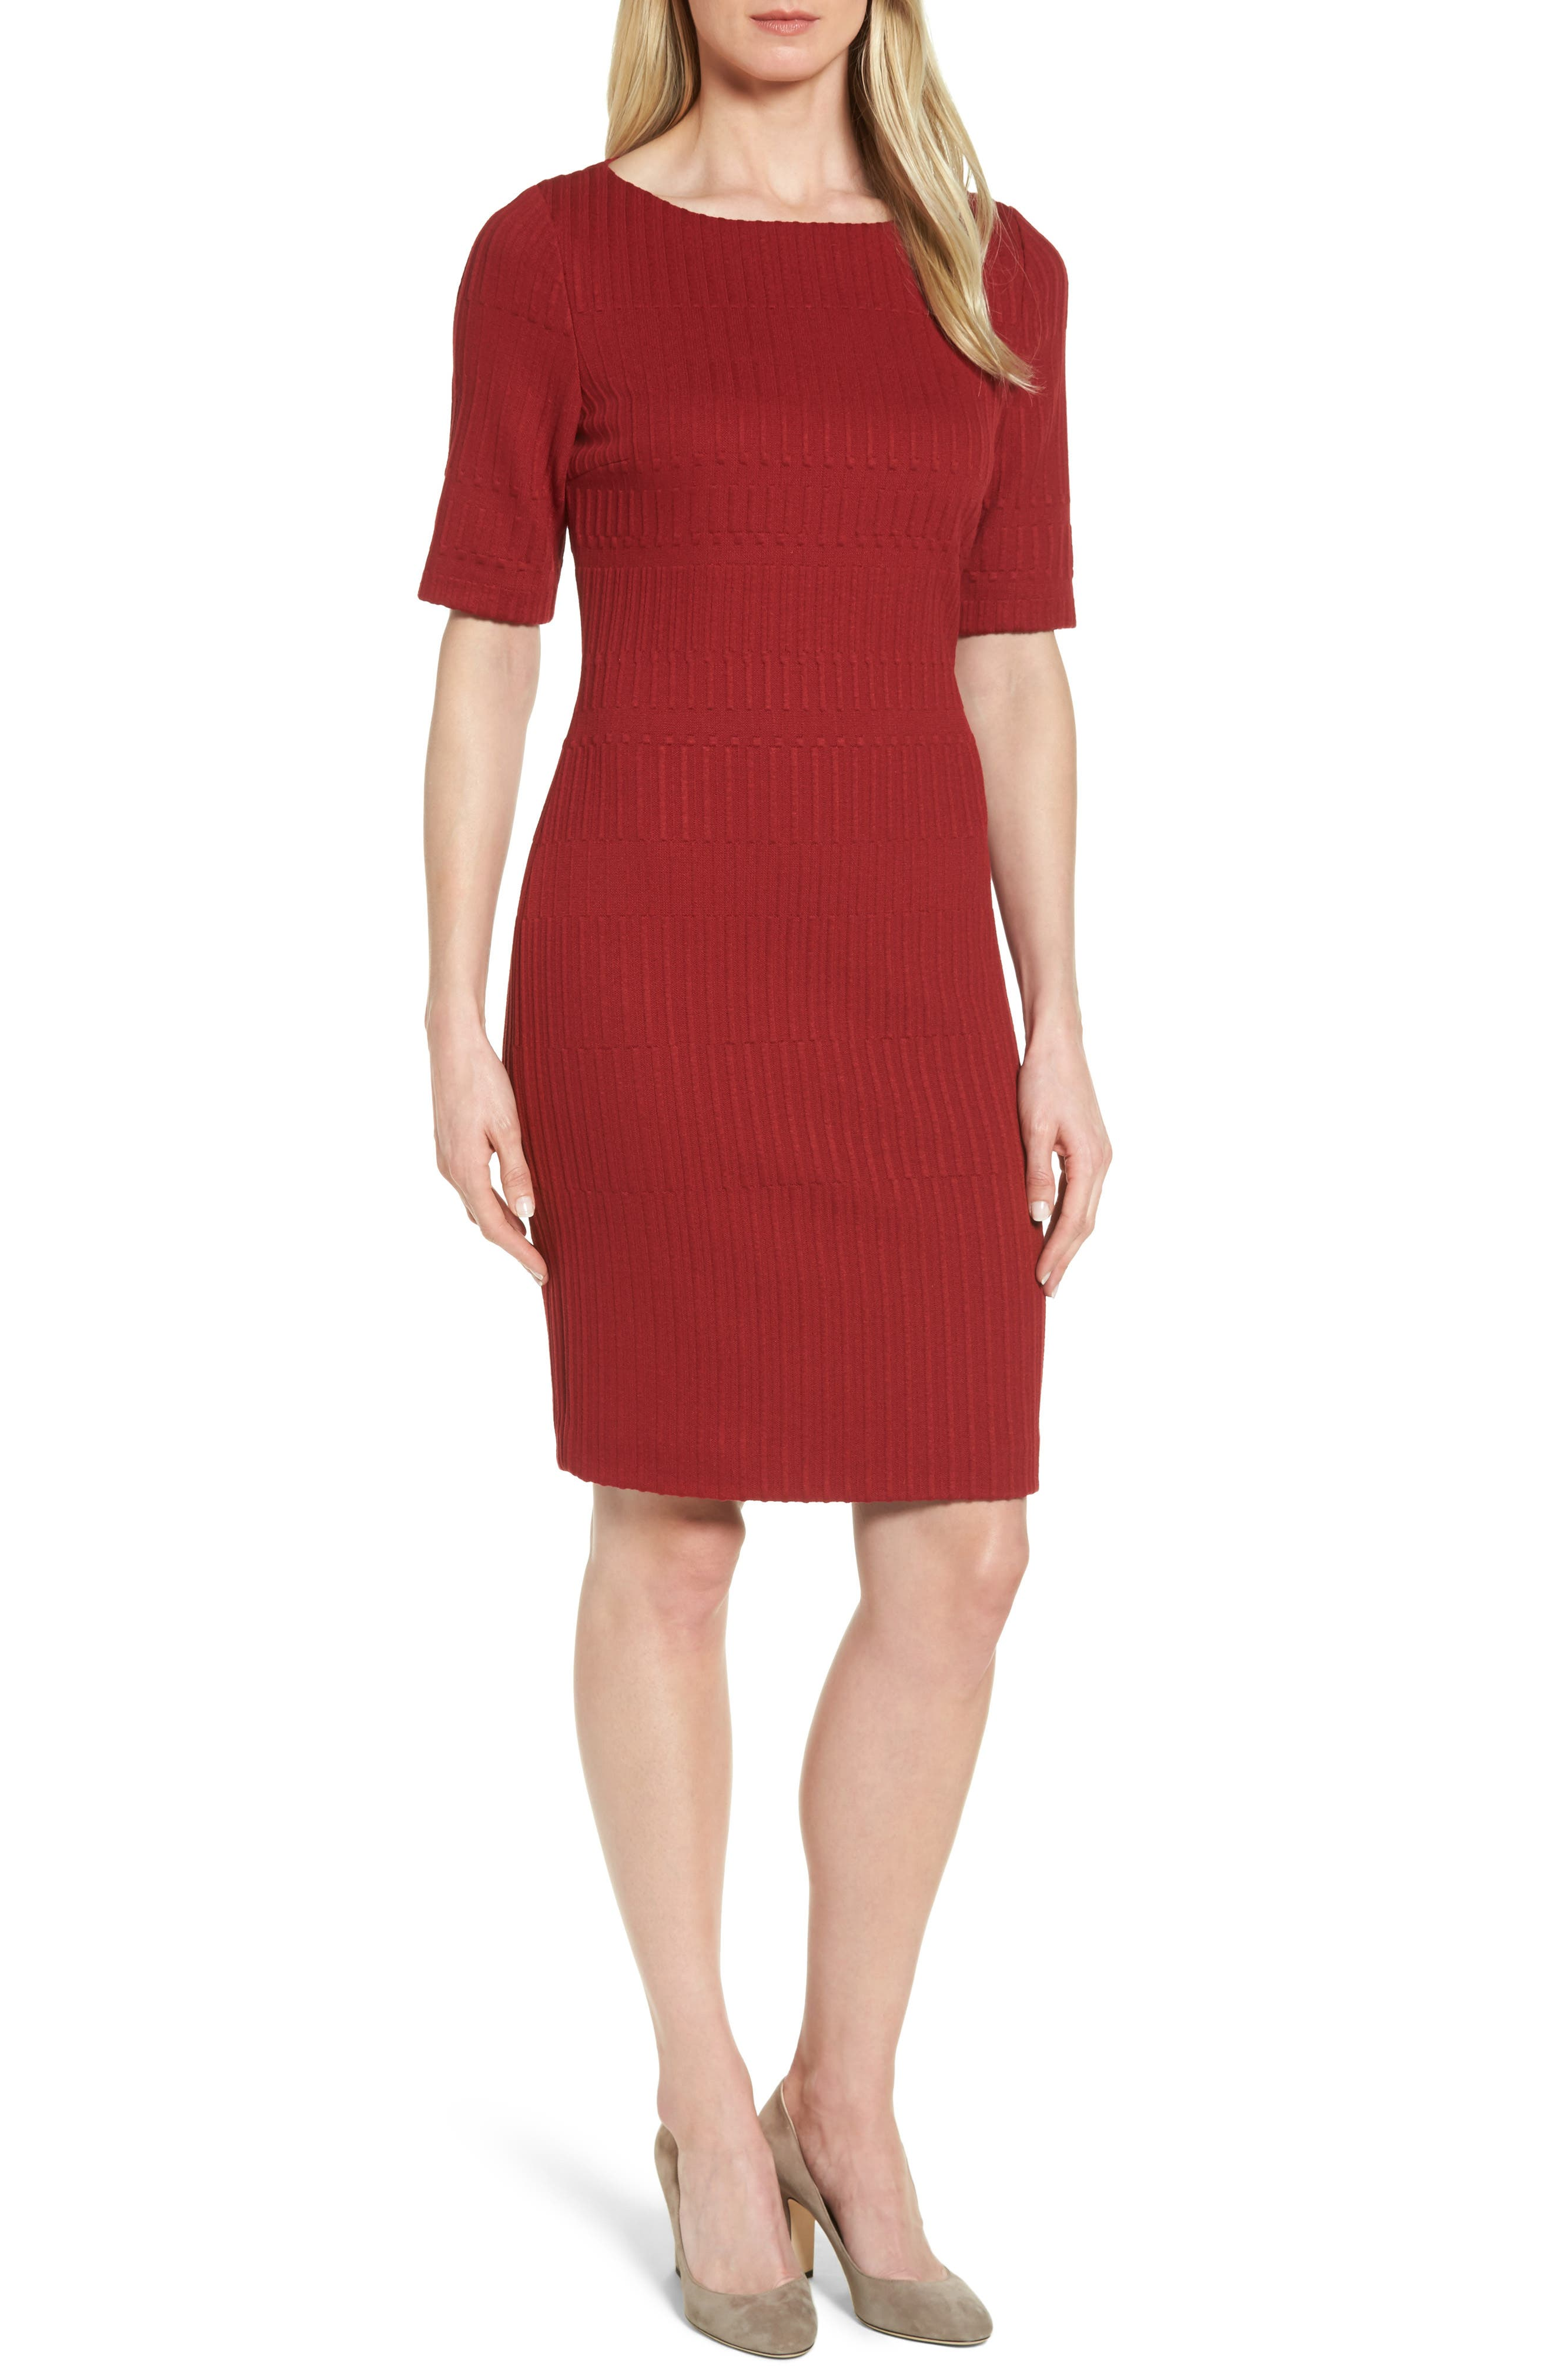 Hadea Knit Sheath Dress,                         Main,                         color, 619